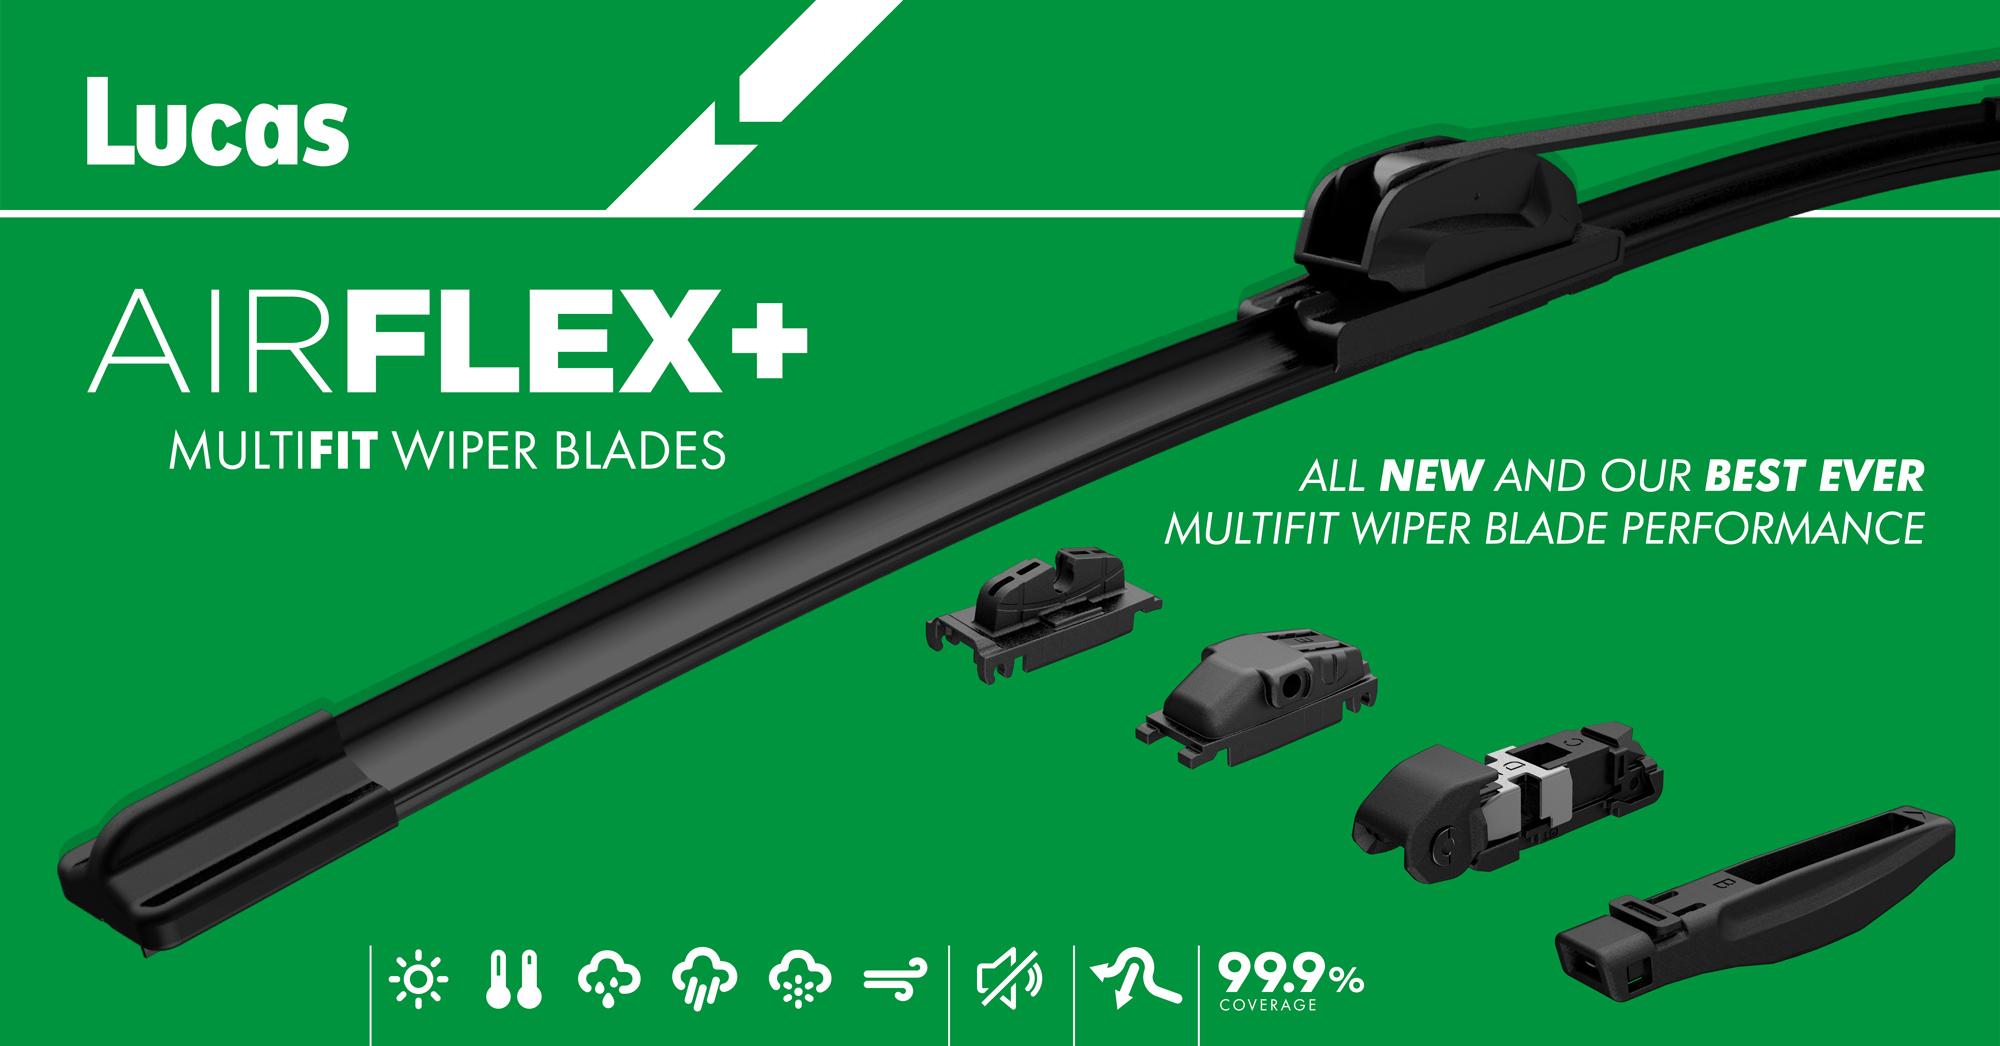 Lucas AirFLEX Plus Wiper Blade